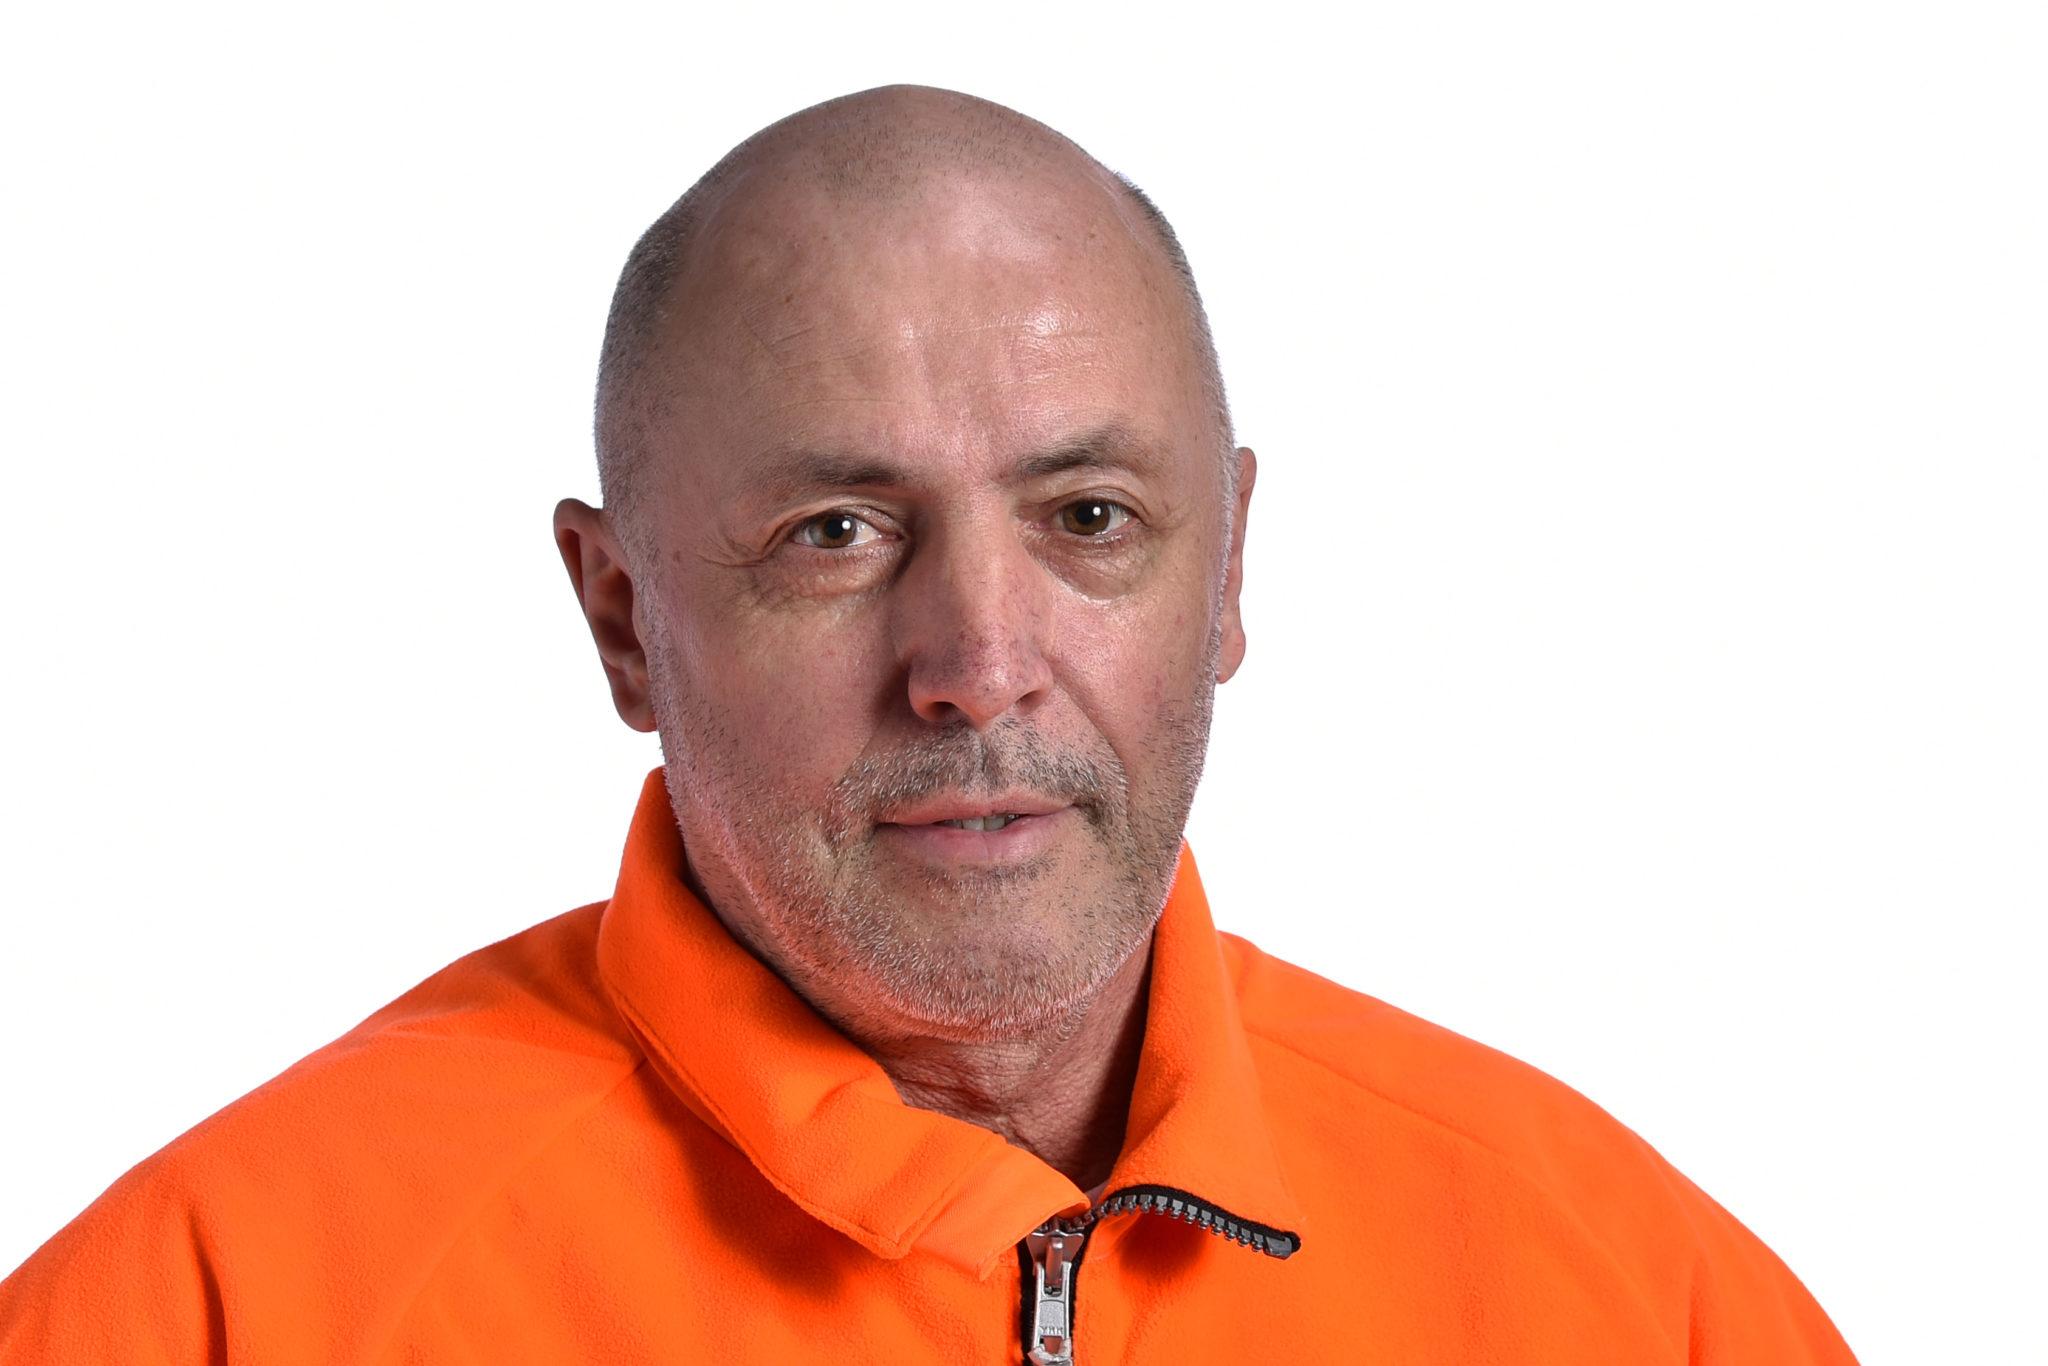 Andreas Szehr